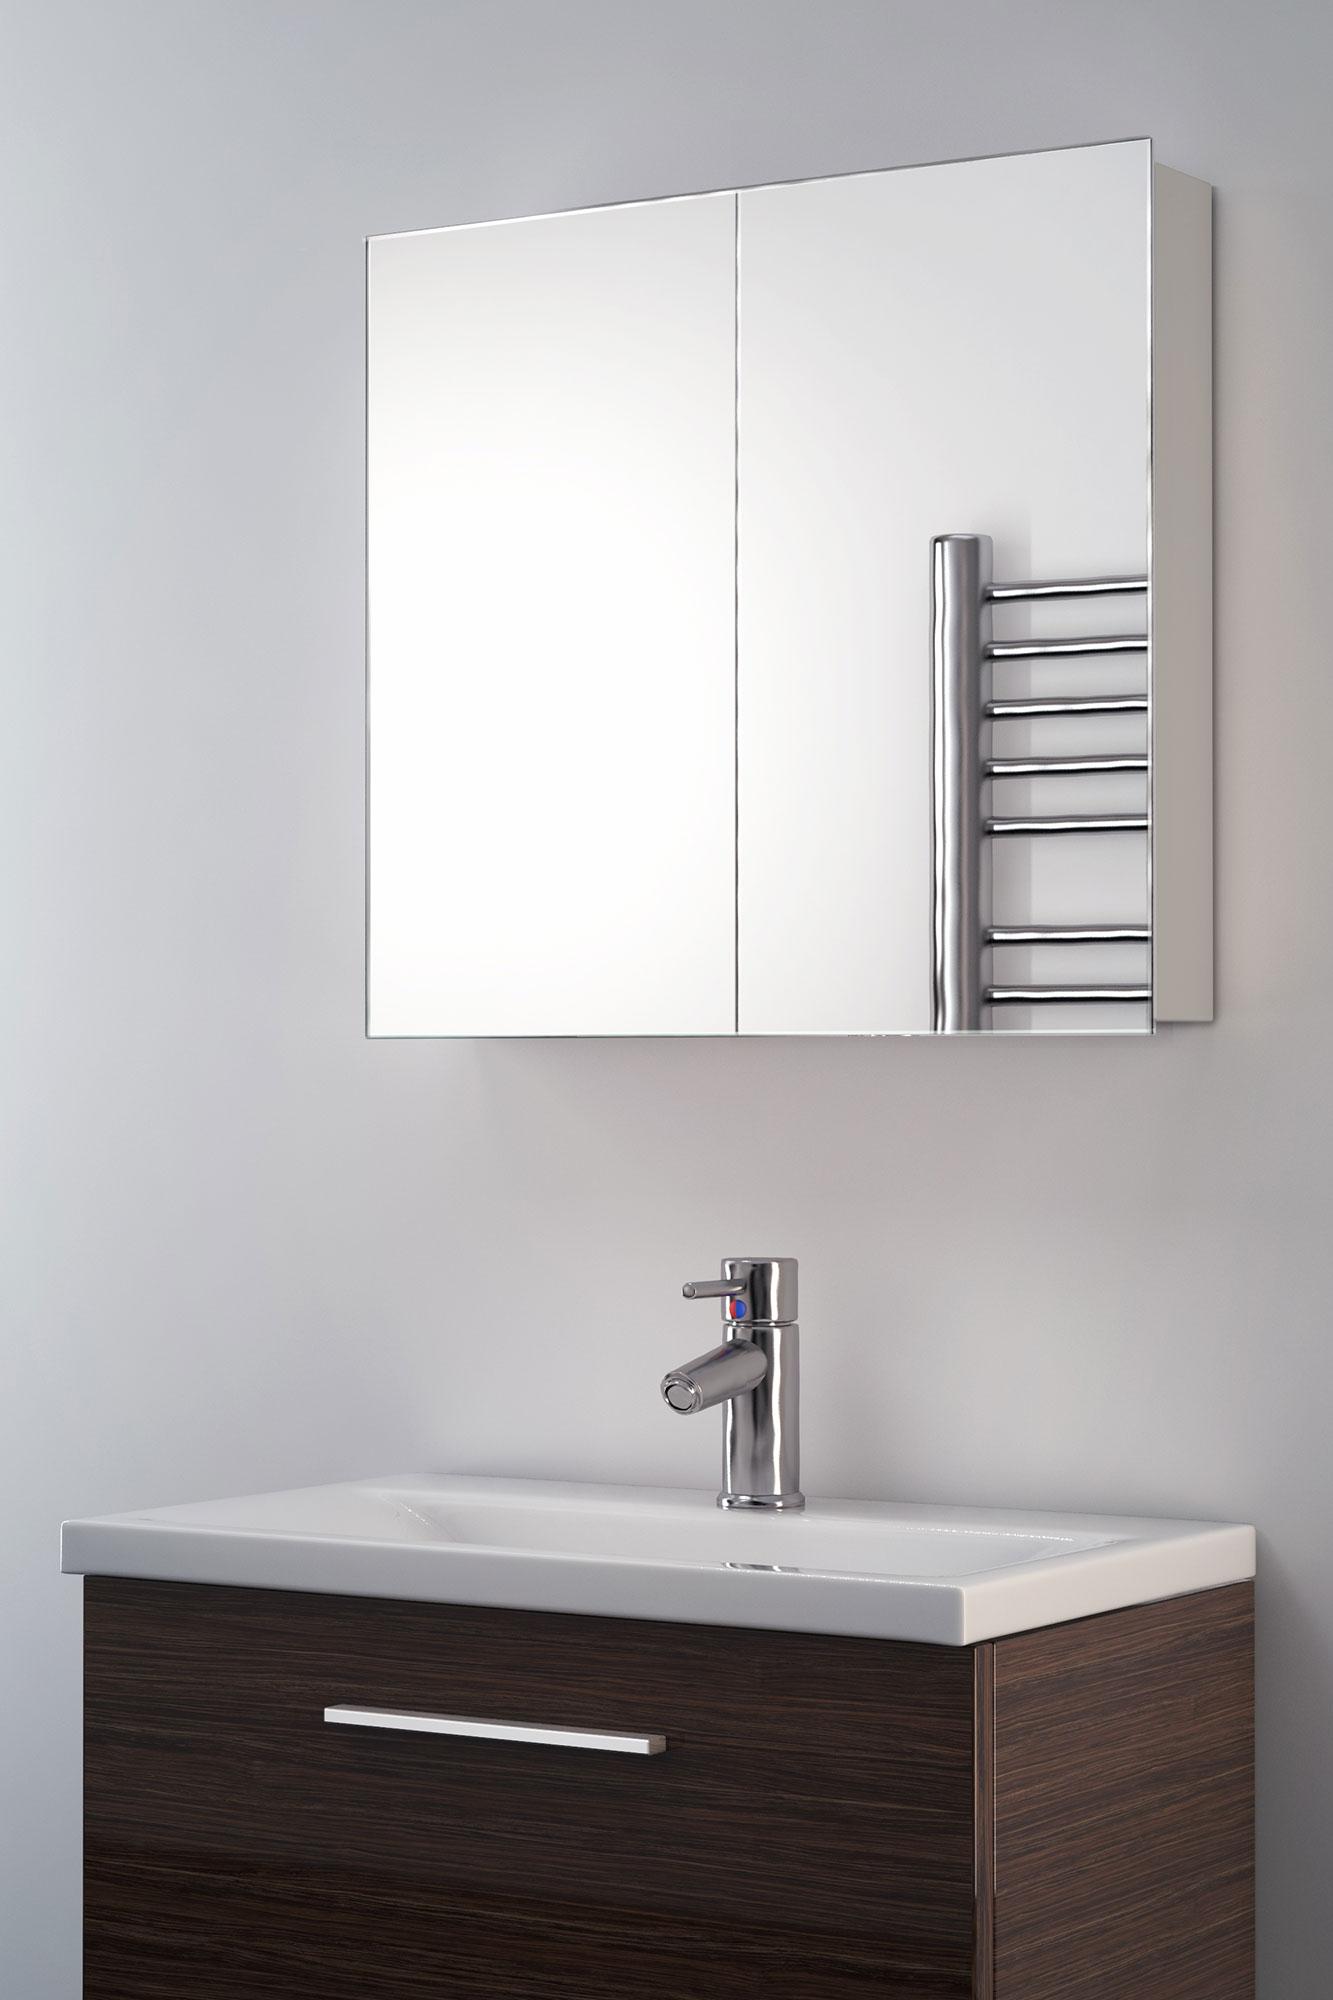 Bathroom Mirrors Illuminated: Eleanor Non-Illuminated Bathroom Mirror Cabinet K137